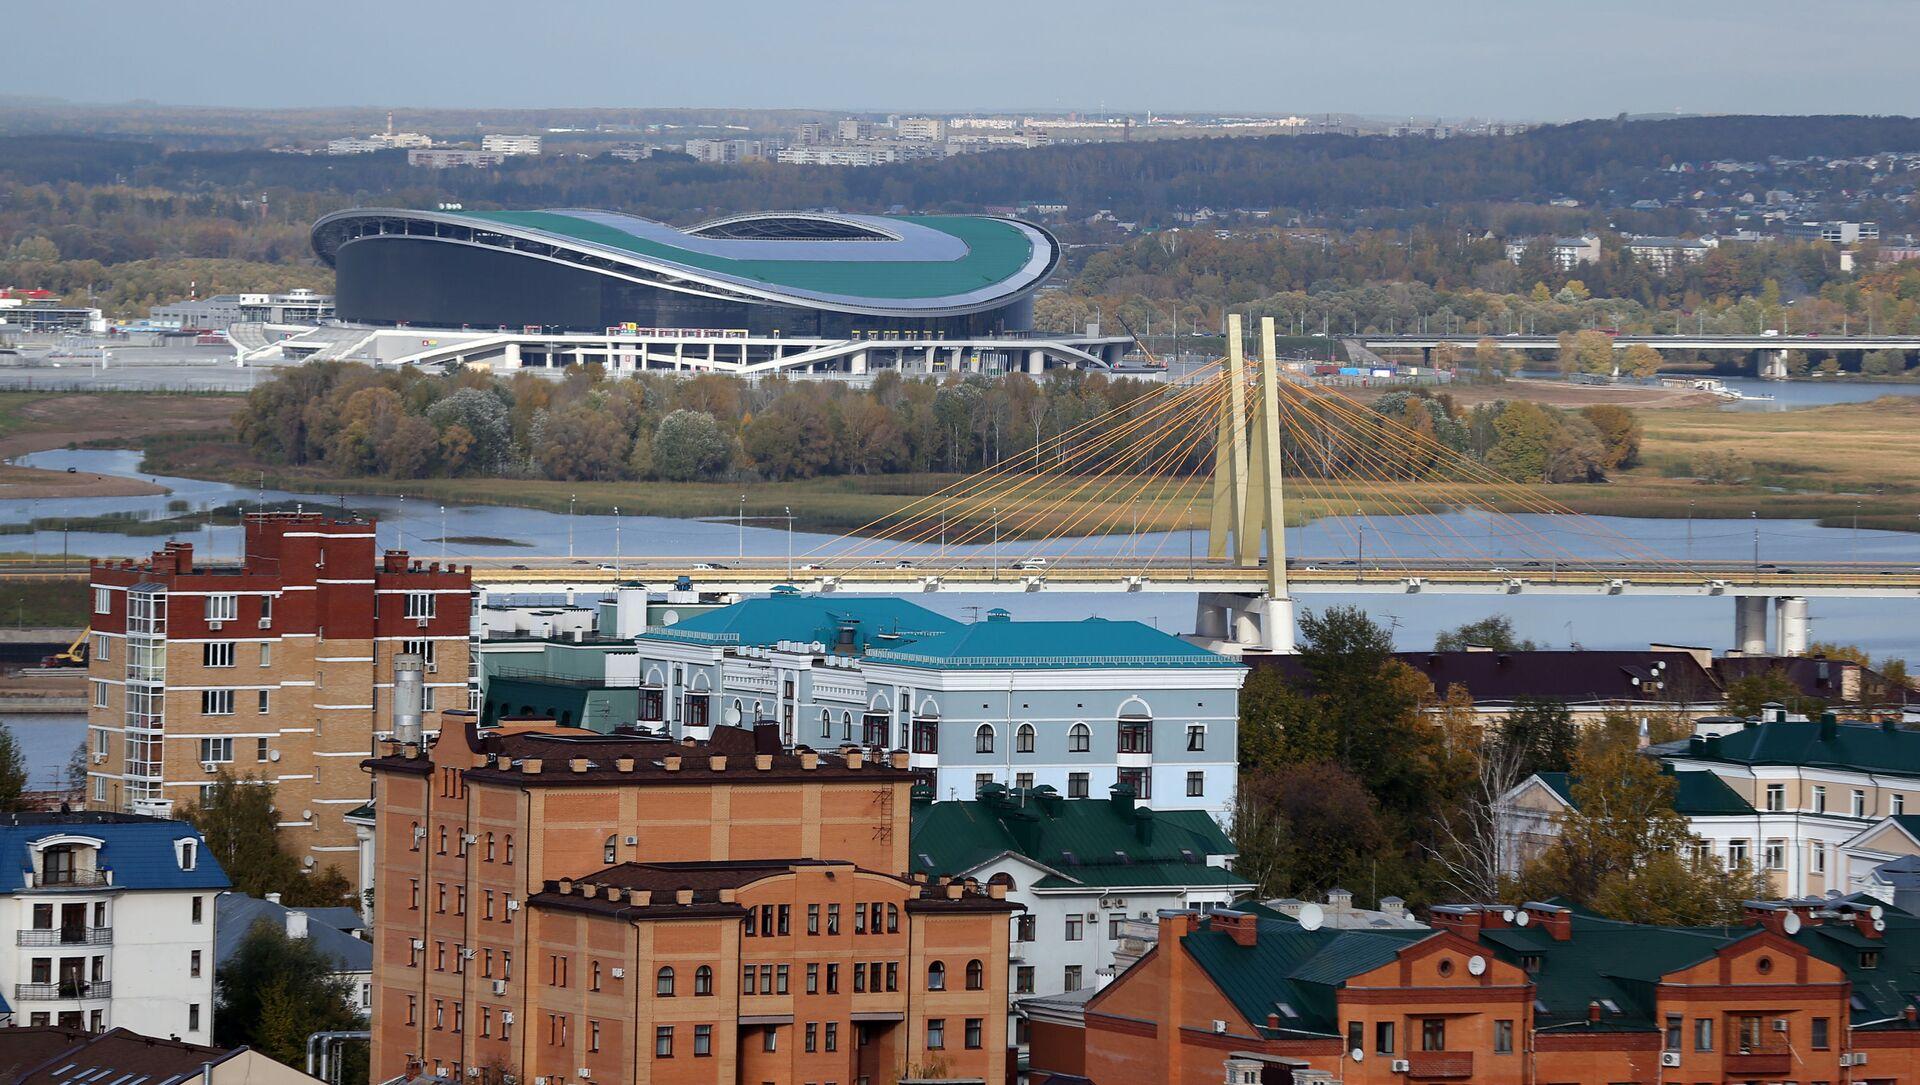 Вид на мост Миллениум и стадион Казань-Арена (слева) в Казани - Sputnik Azərbaycan, 1920, 06.09.2021